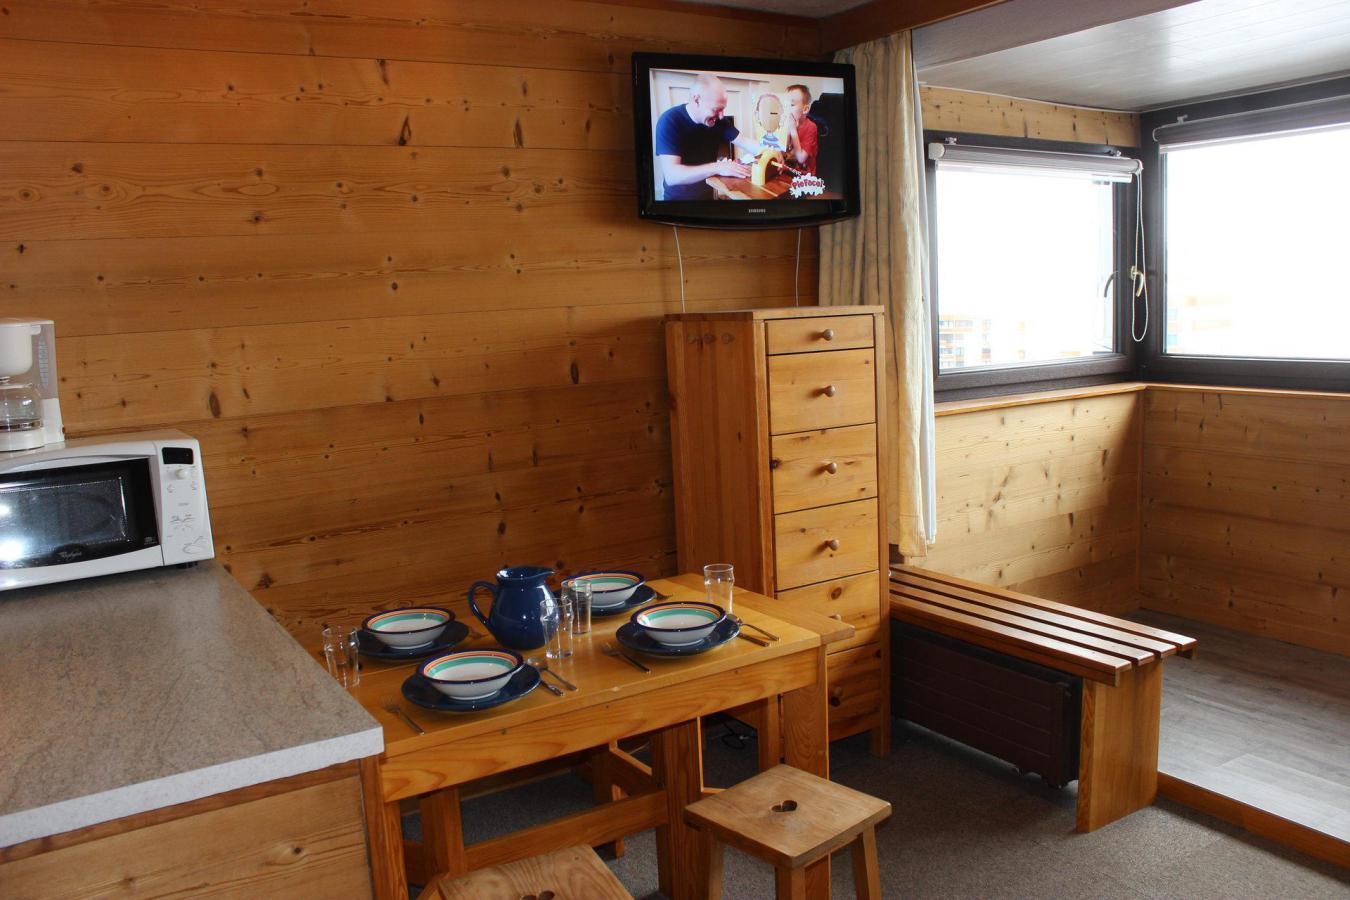 Location au ski Studio 4 personnes (154) - Residence Neves - Val Thorens - Séjour